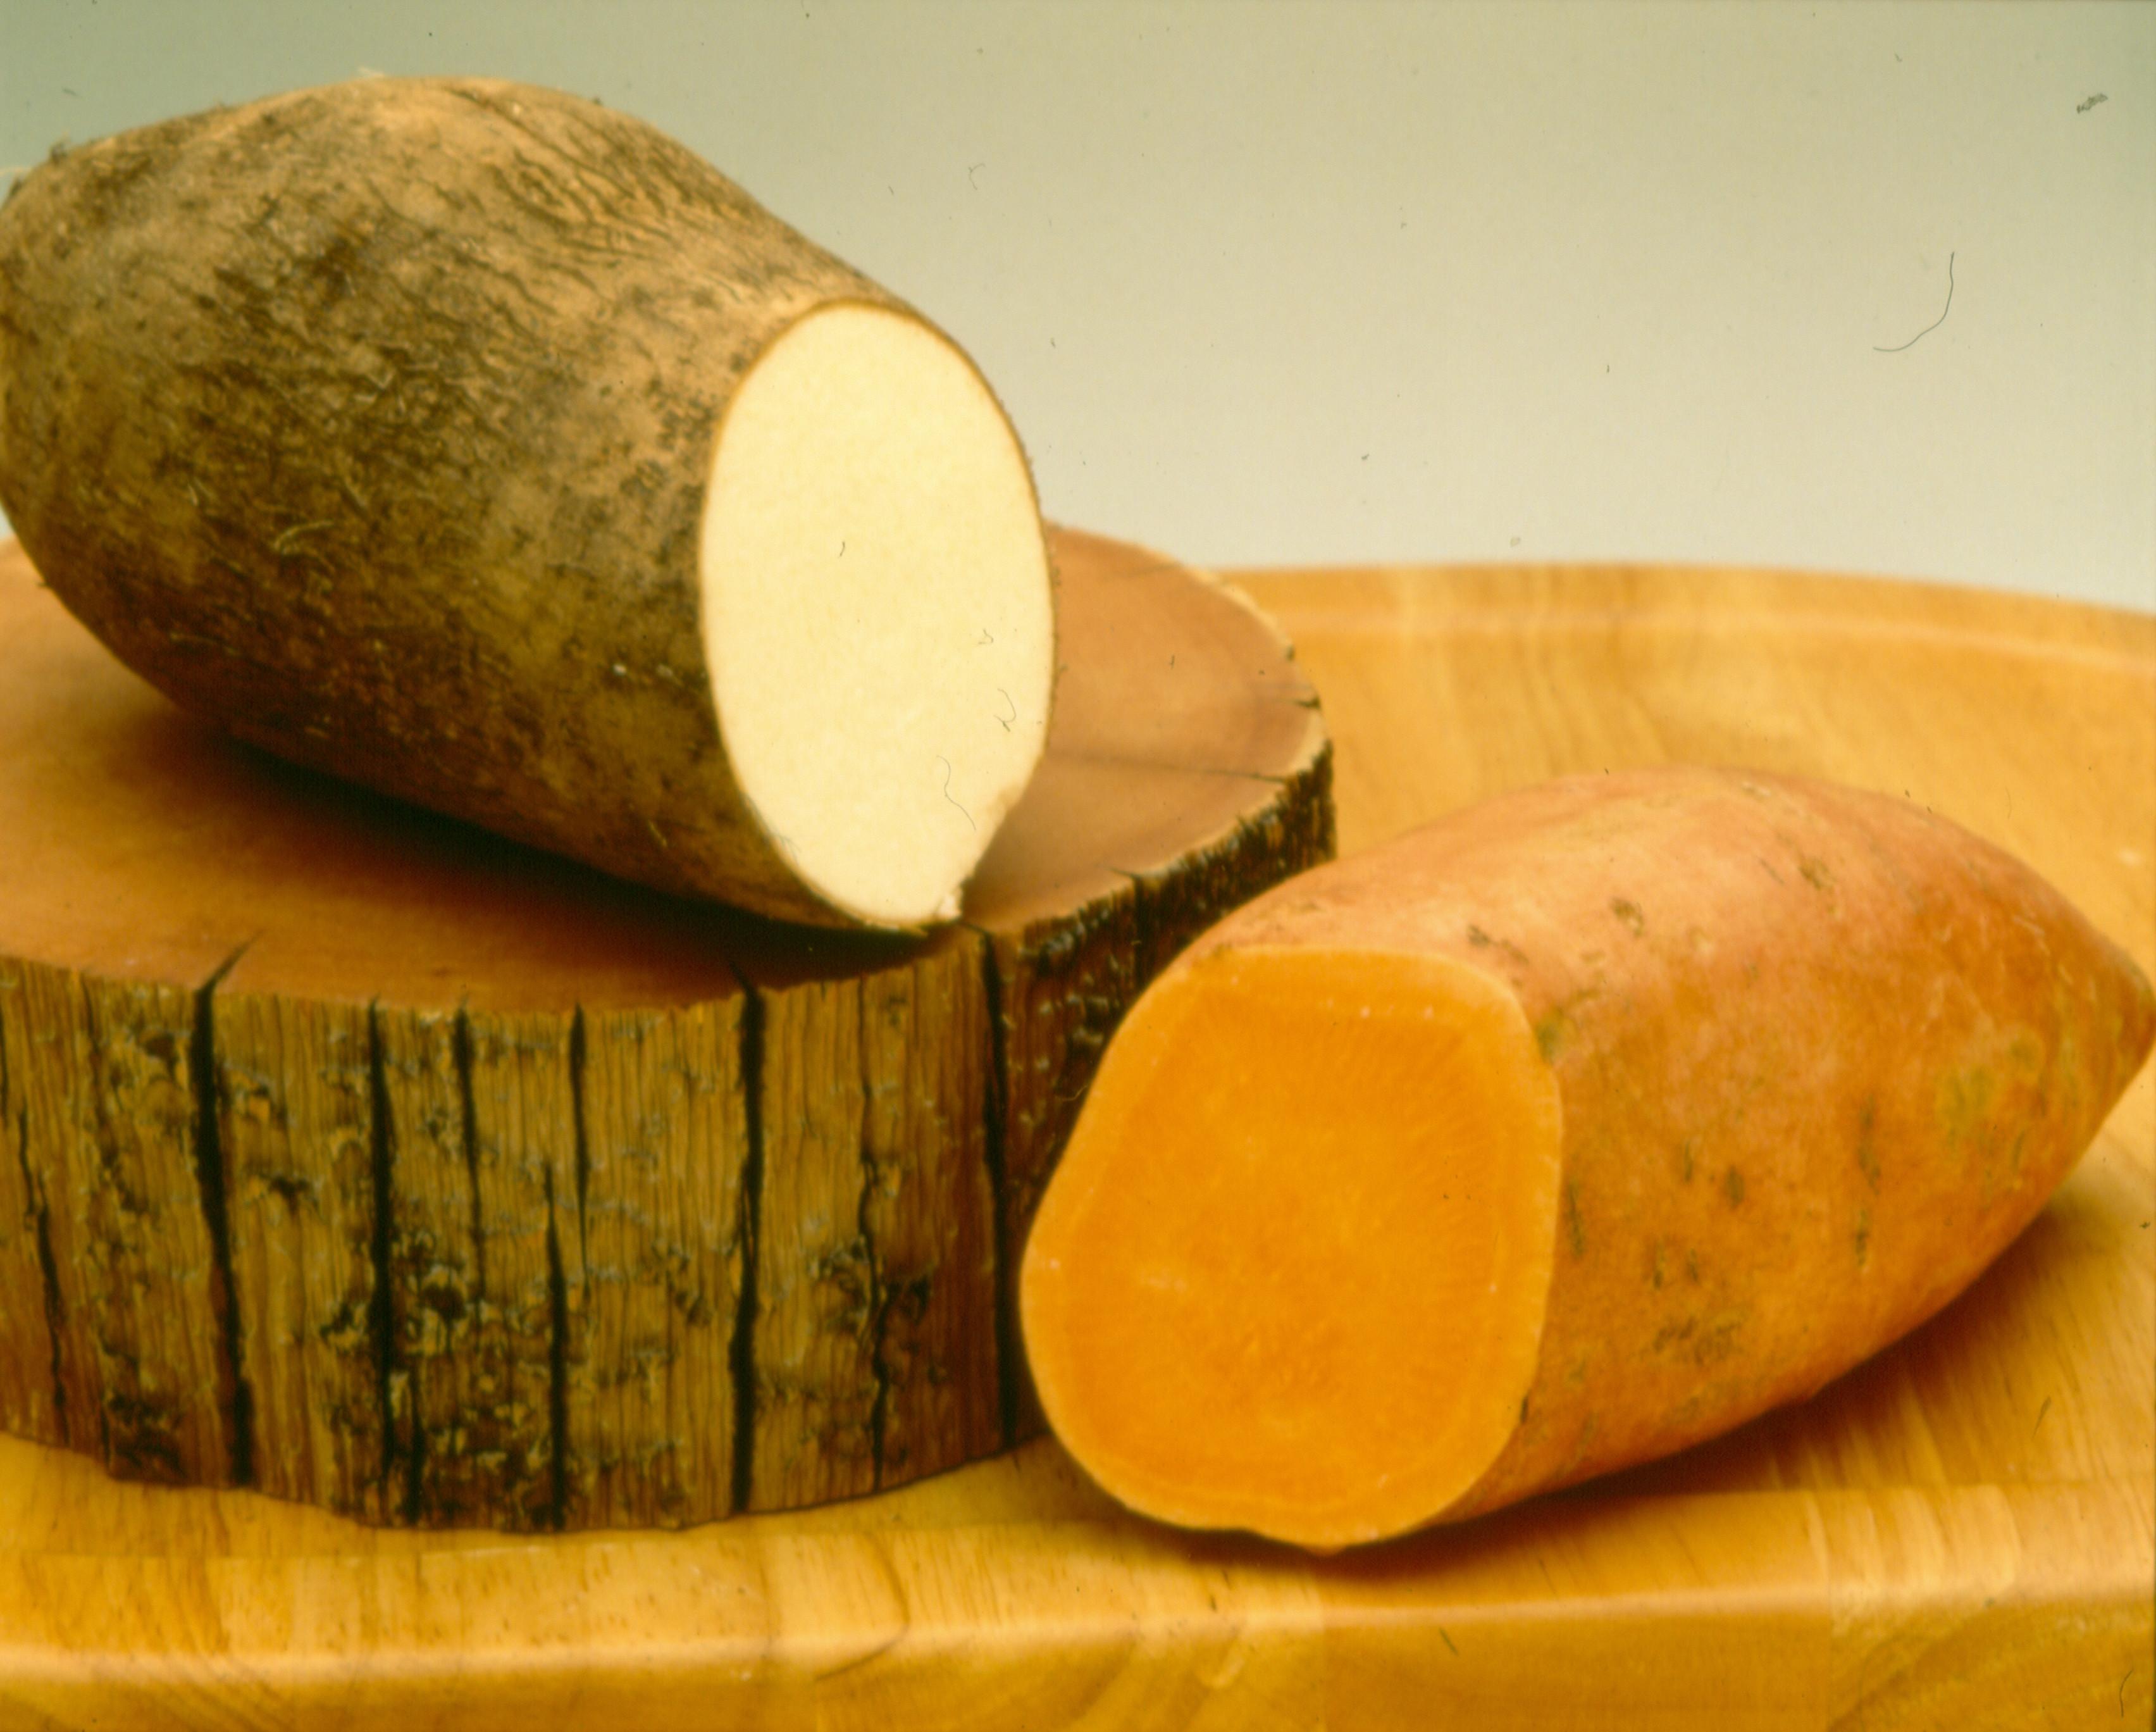 What Is A Potato  Produce Confusion Yam or Sweet Potato Rutabaga or Turnip